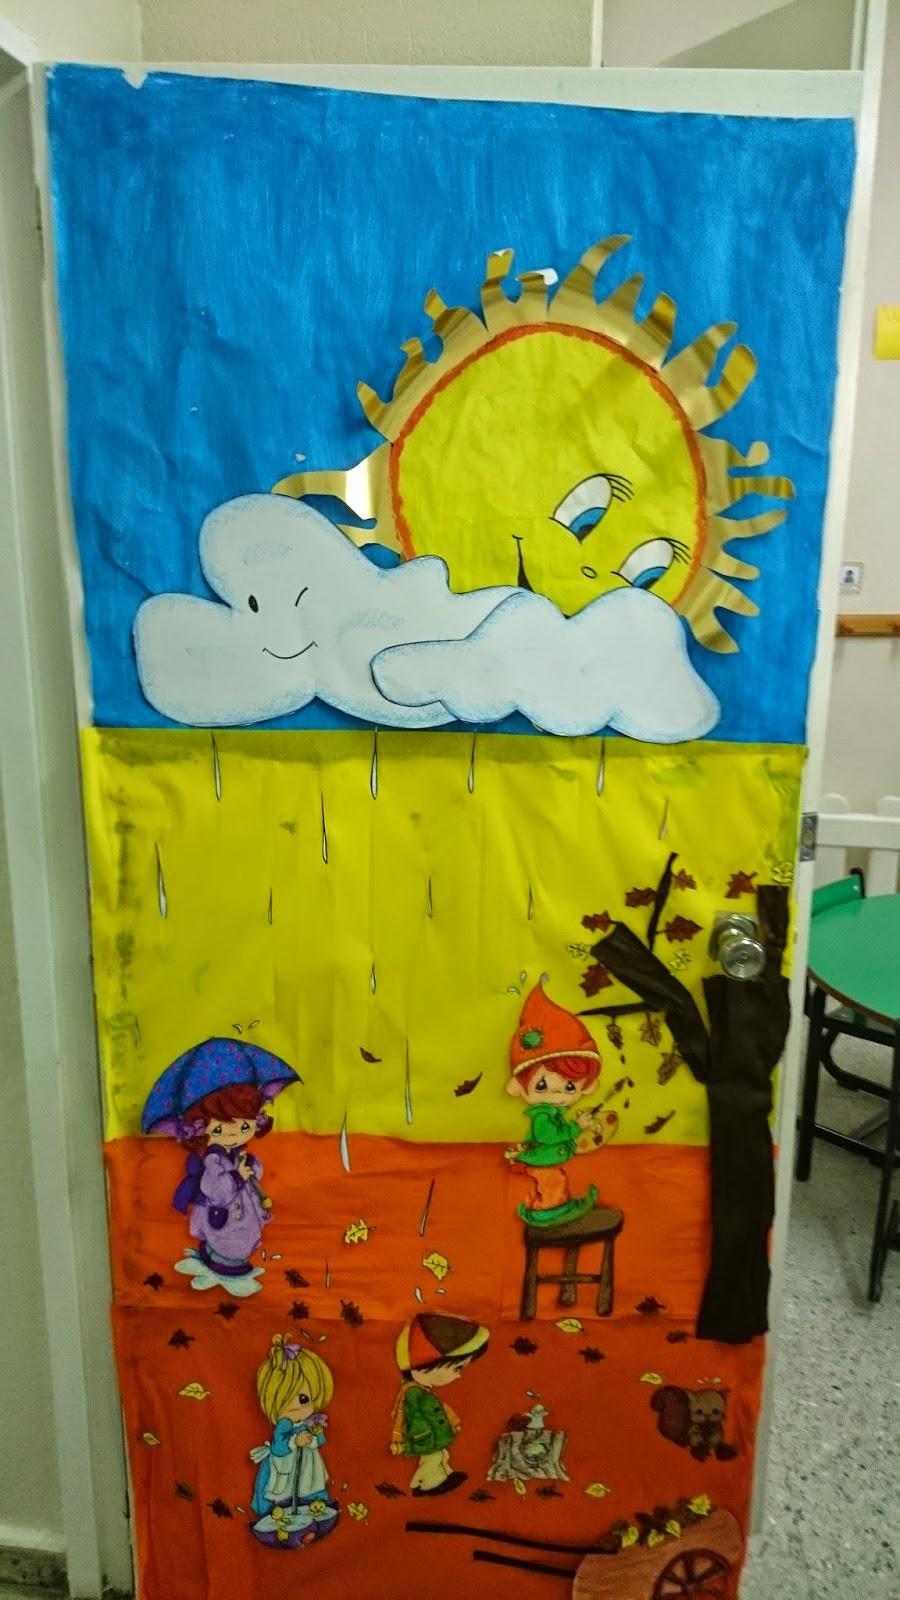 Imagenes de puertas decoradas preescolar puertas primavera for Decoracion puerta aula infantil